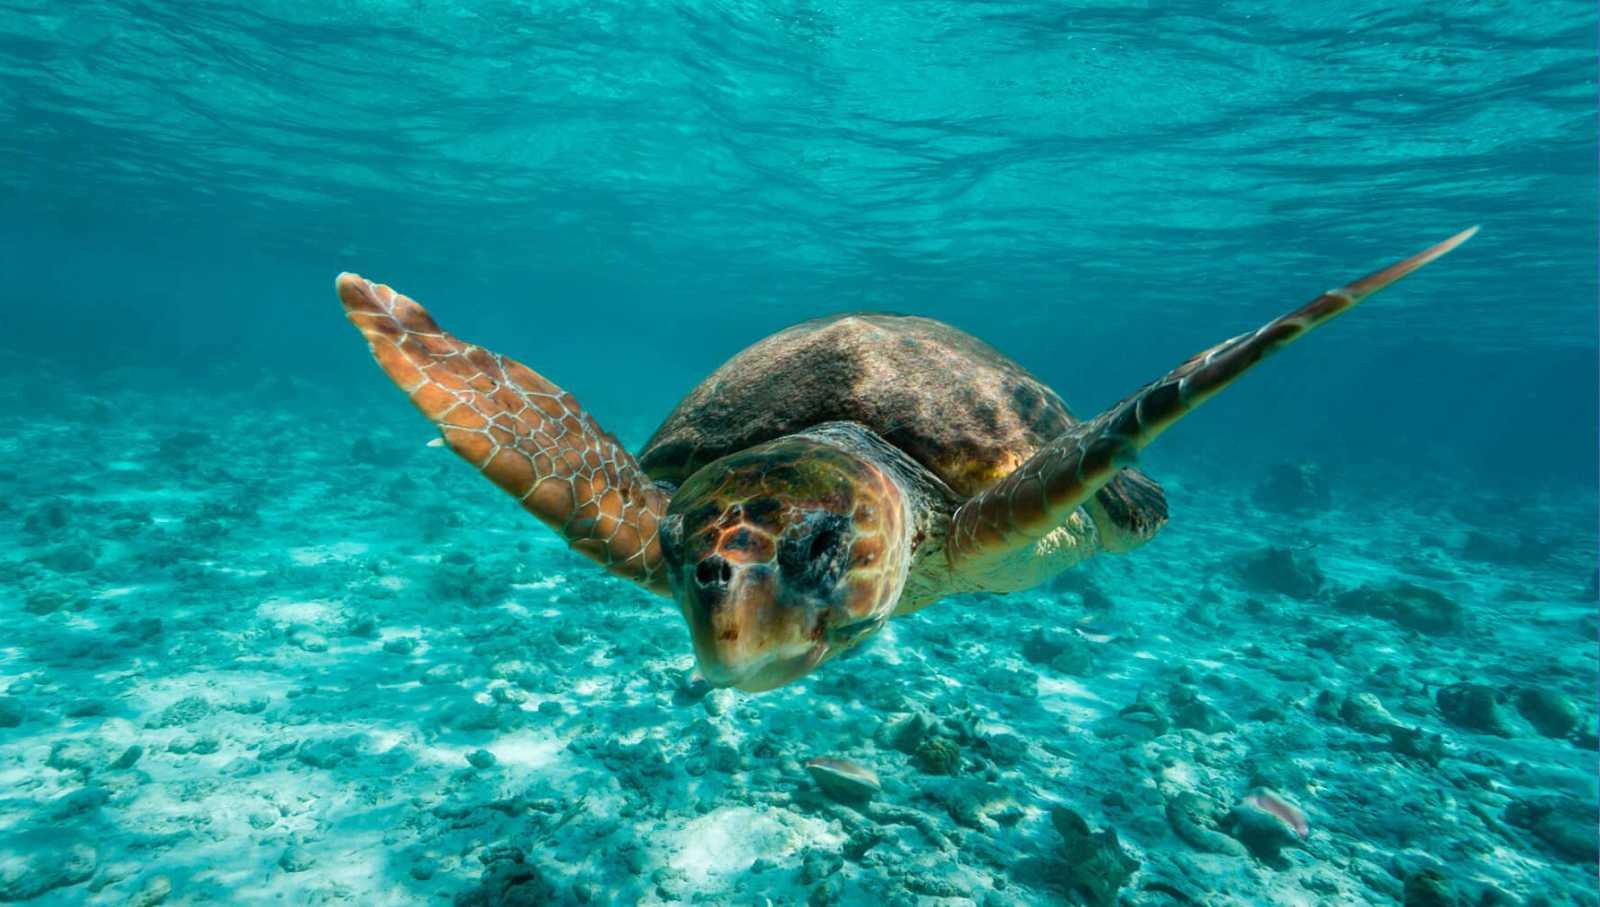 Españoles en la mar - Al rescate de la tortuga boba - escuchar ahora